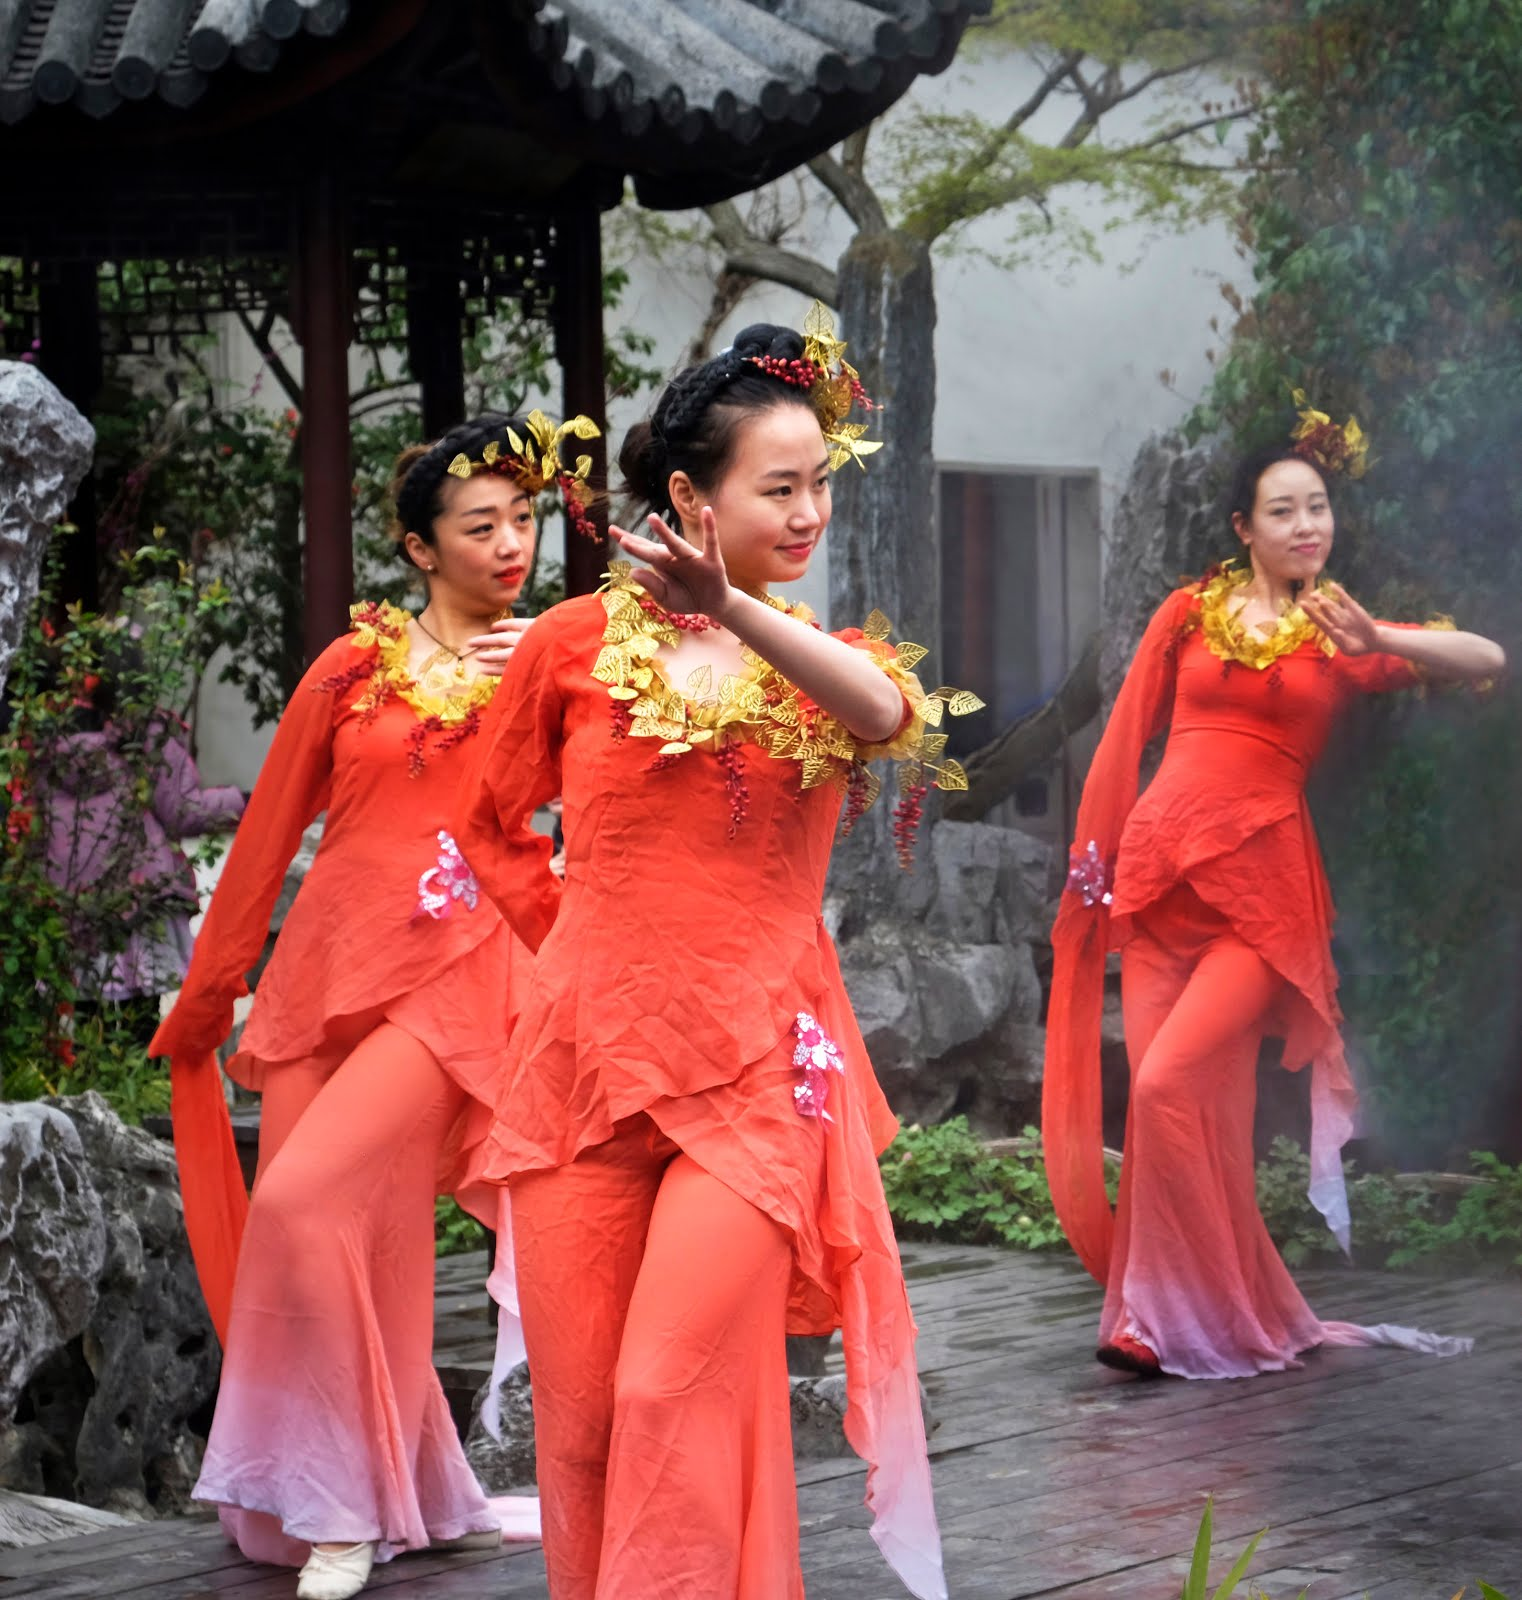 Les danseuses du Jardin Liu